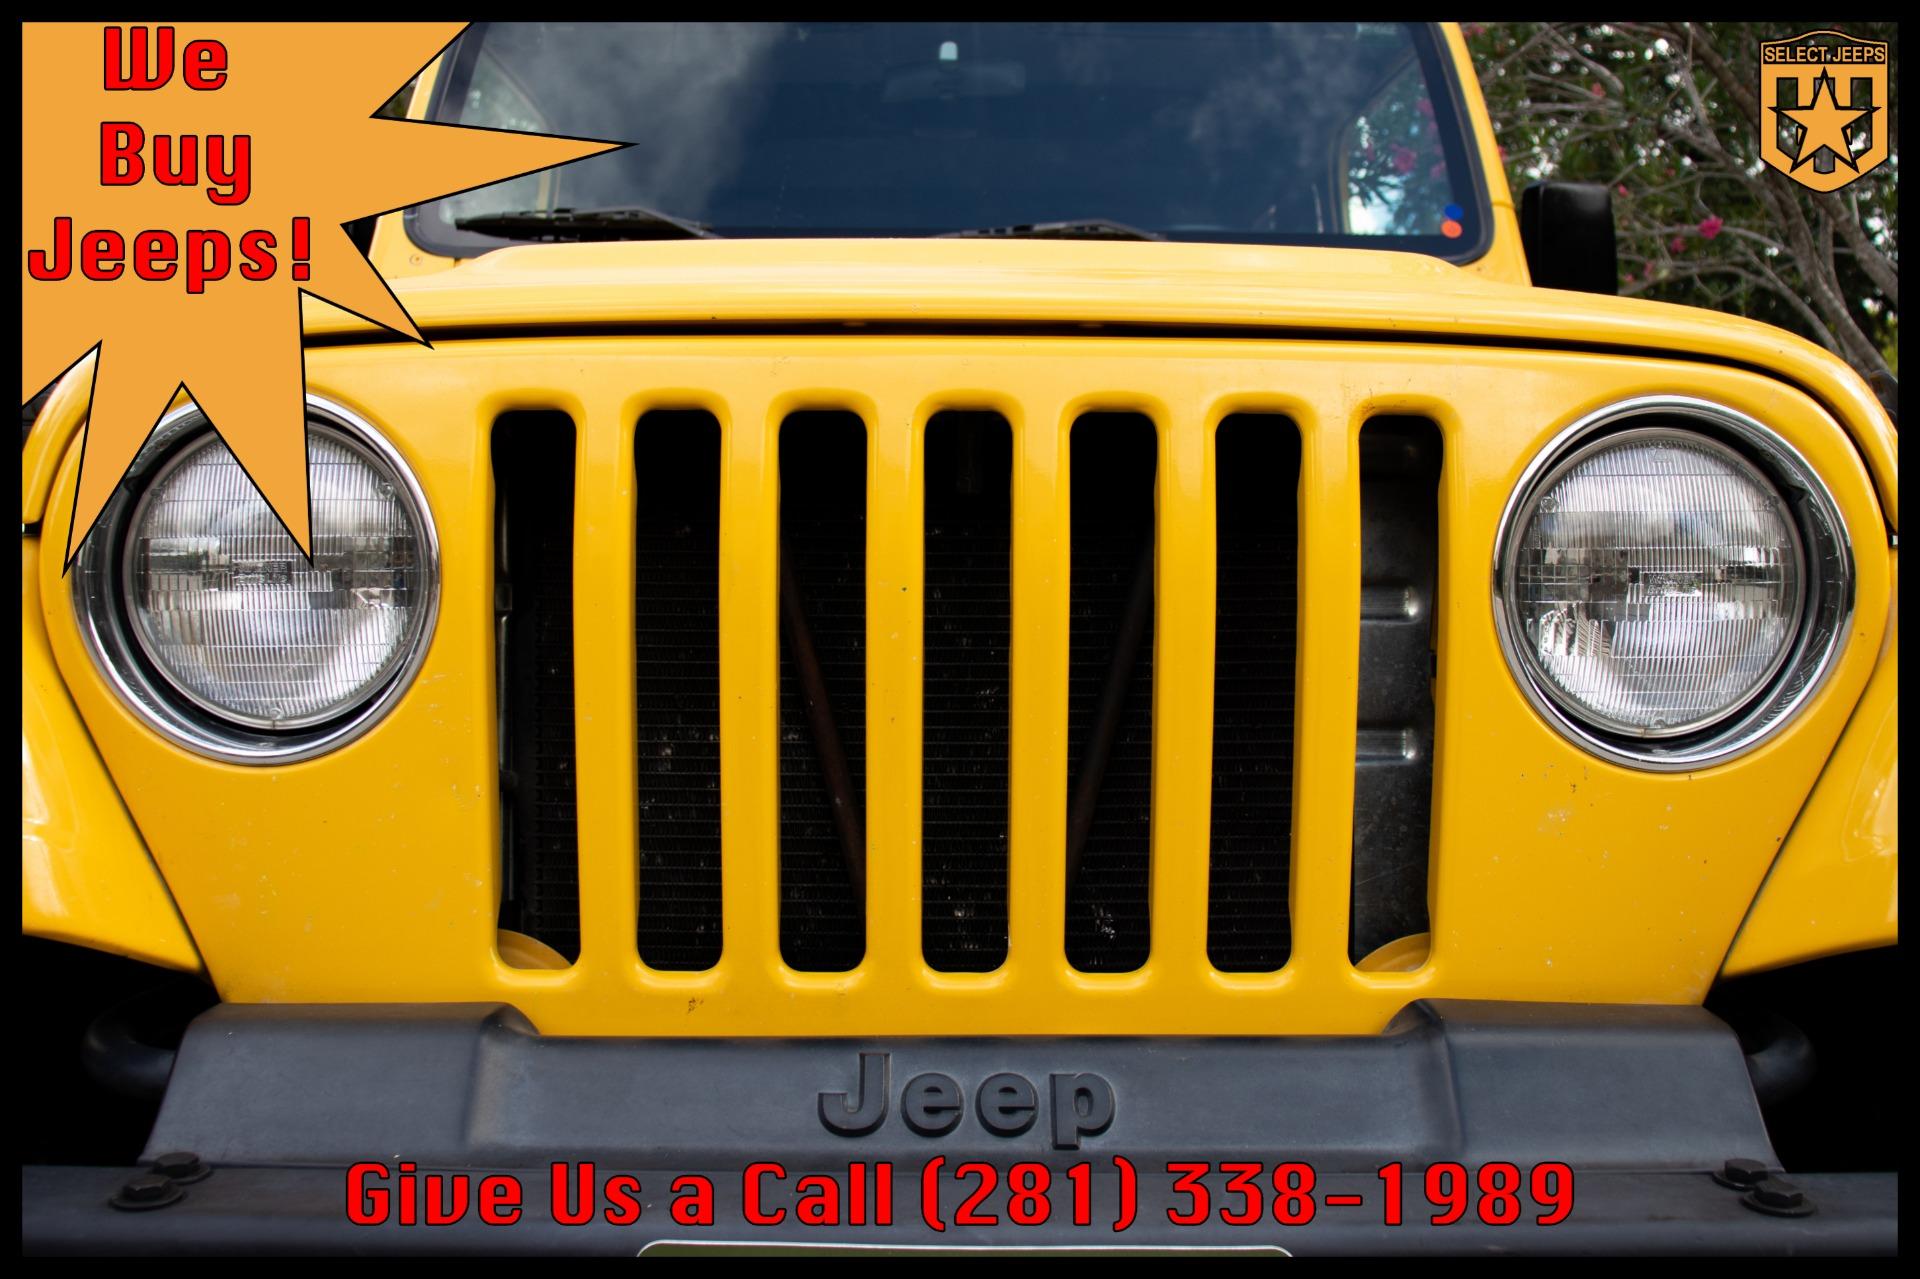 Used-2016-Jeep-Wrangler-Unlimited-Sahara